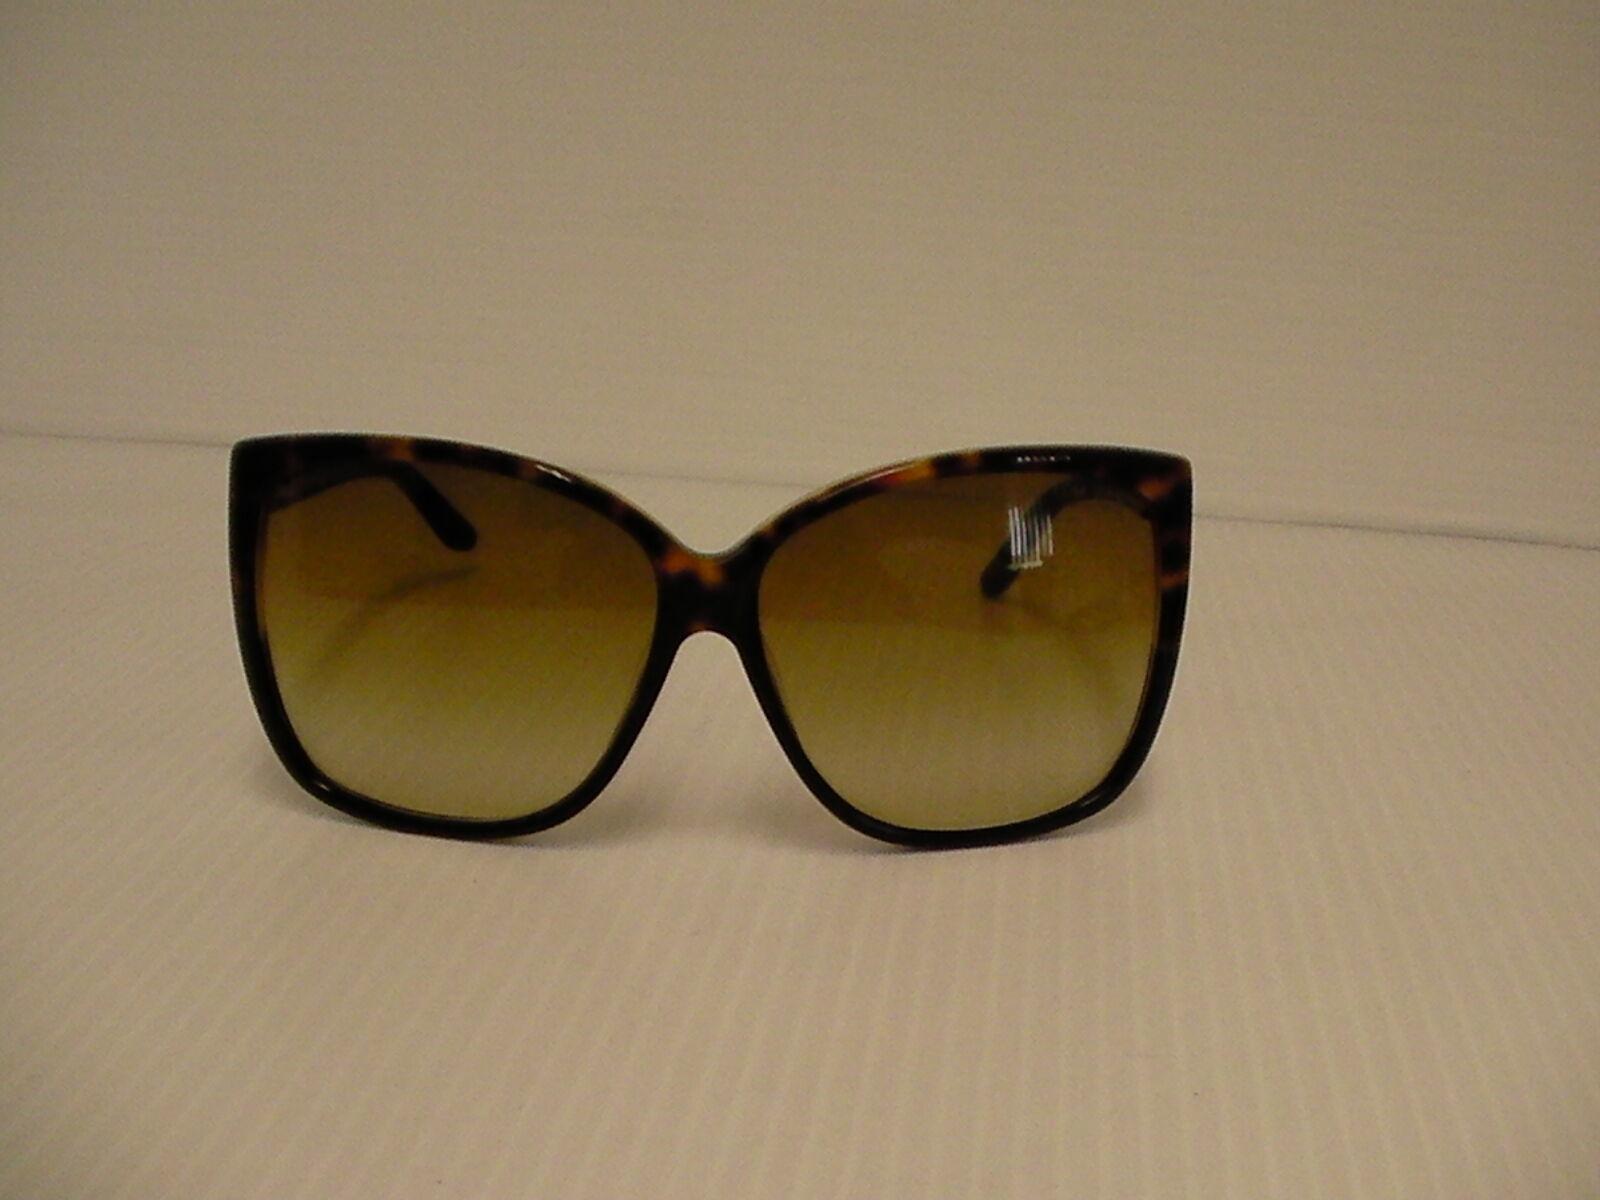 Tom ford New sunglasses womens Lydia TF 228 05F square tortoise - $156.81